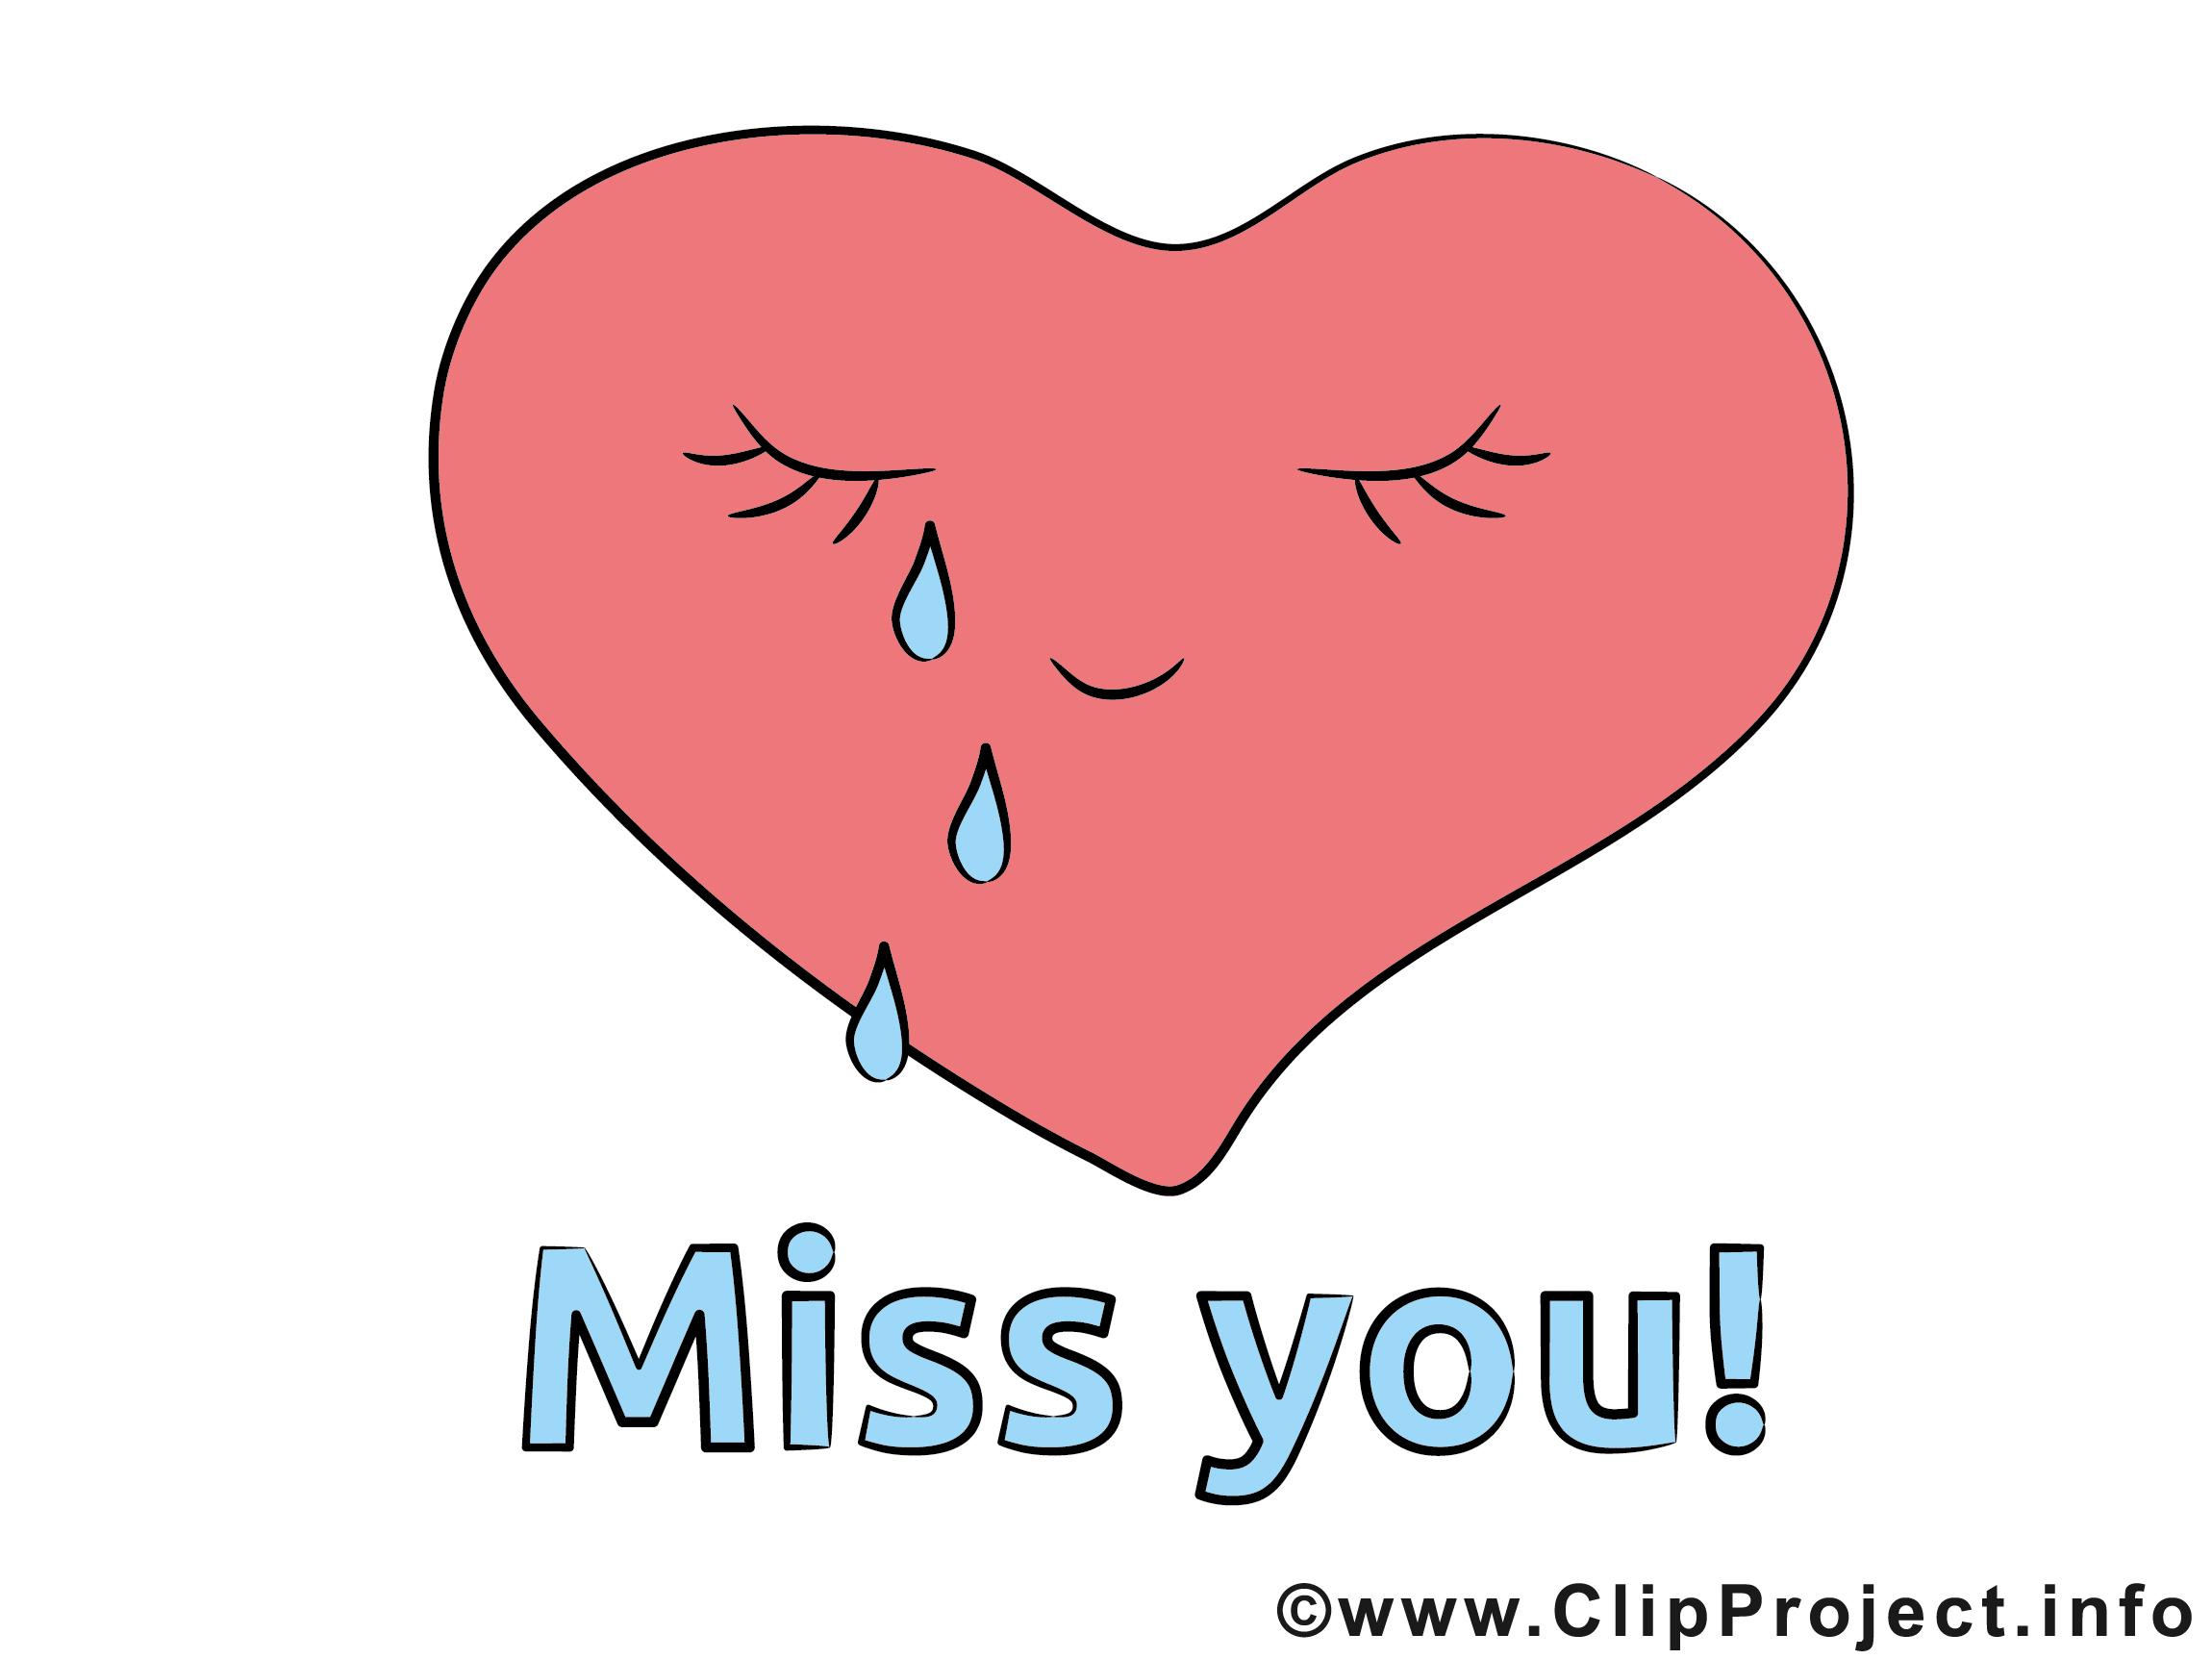 Herzbild Miss you